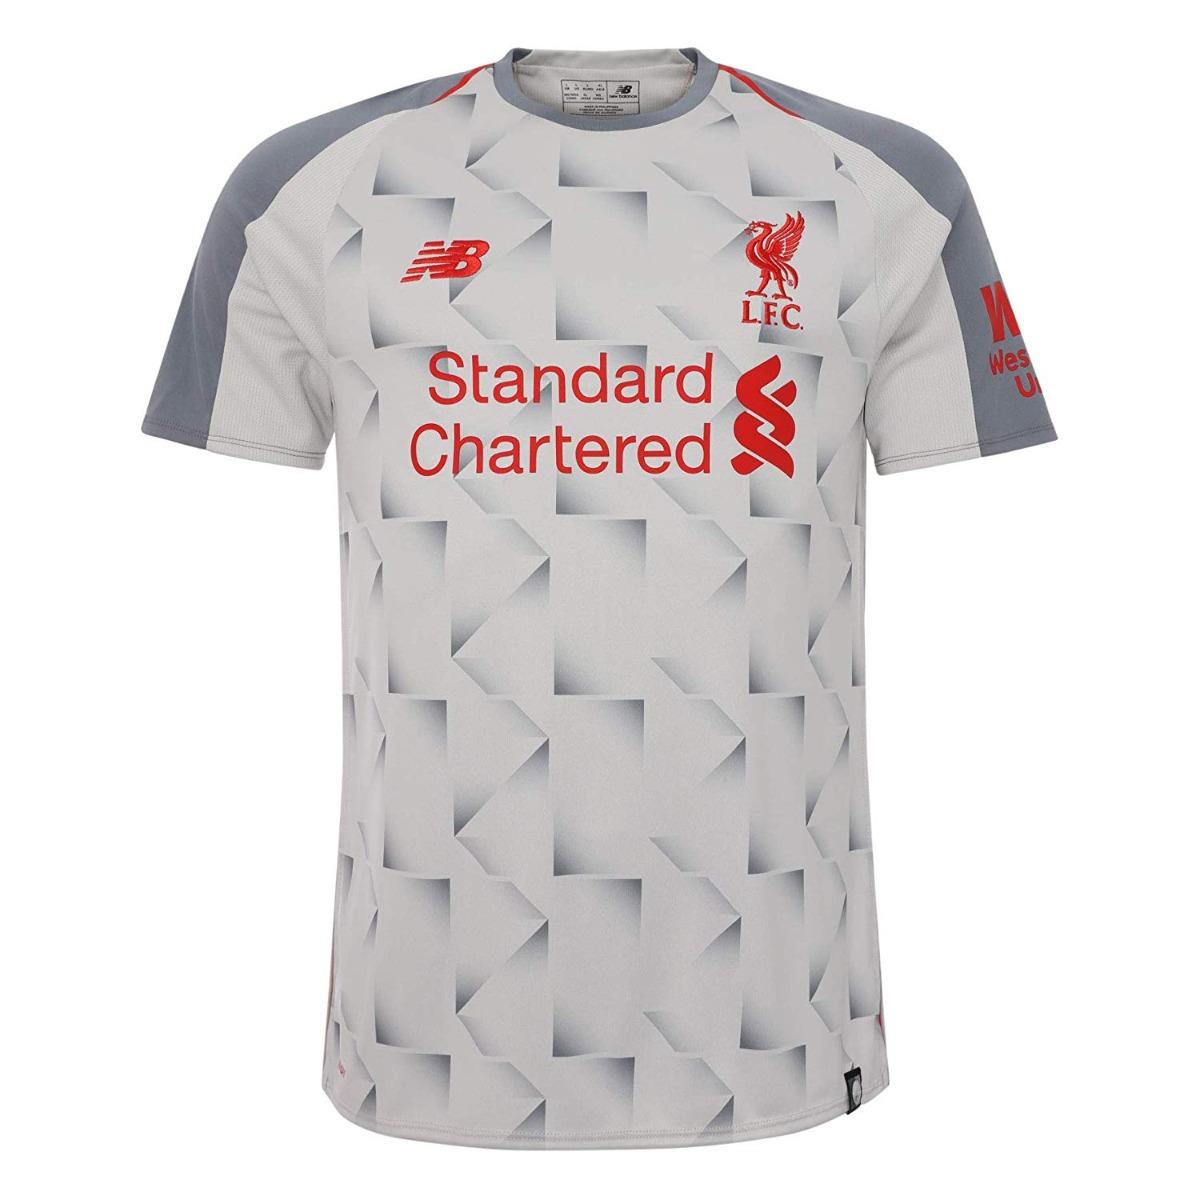 519a7387b77 Jersey Playera Liverpool Tercer Kit 2018-2019 Salah Firminho -   350.00 en Mercado  Libre